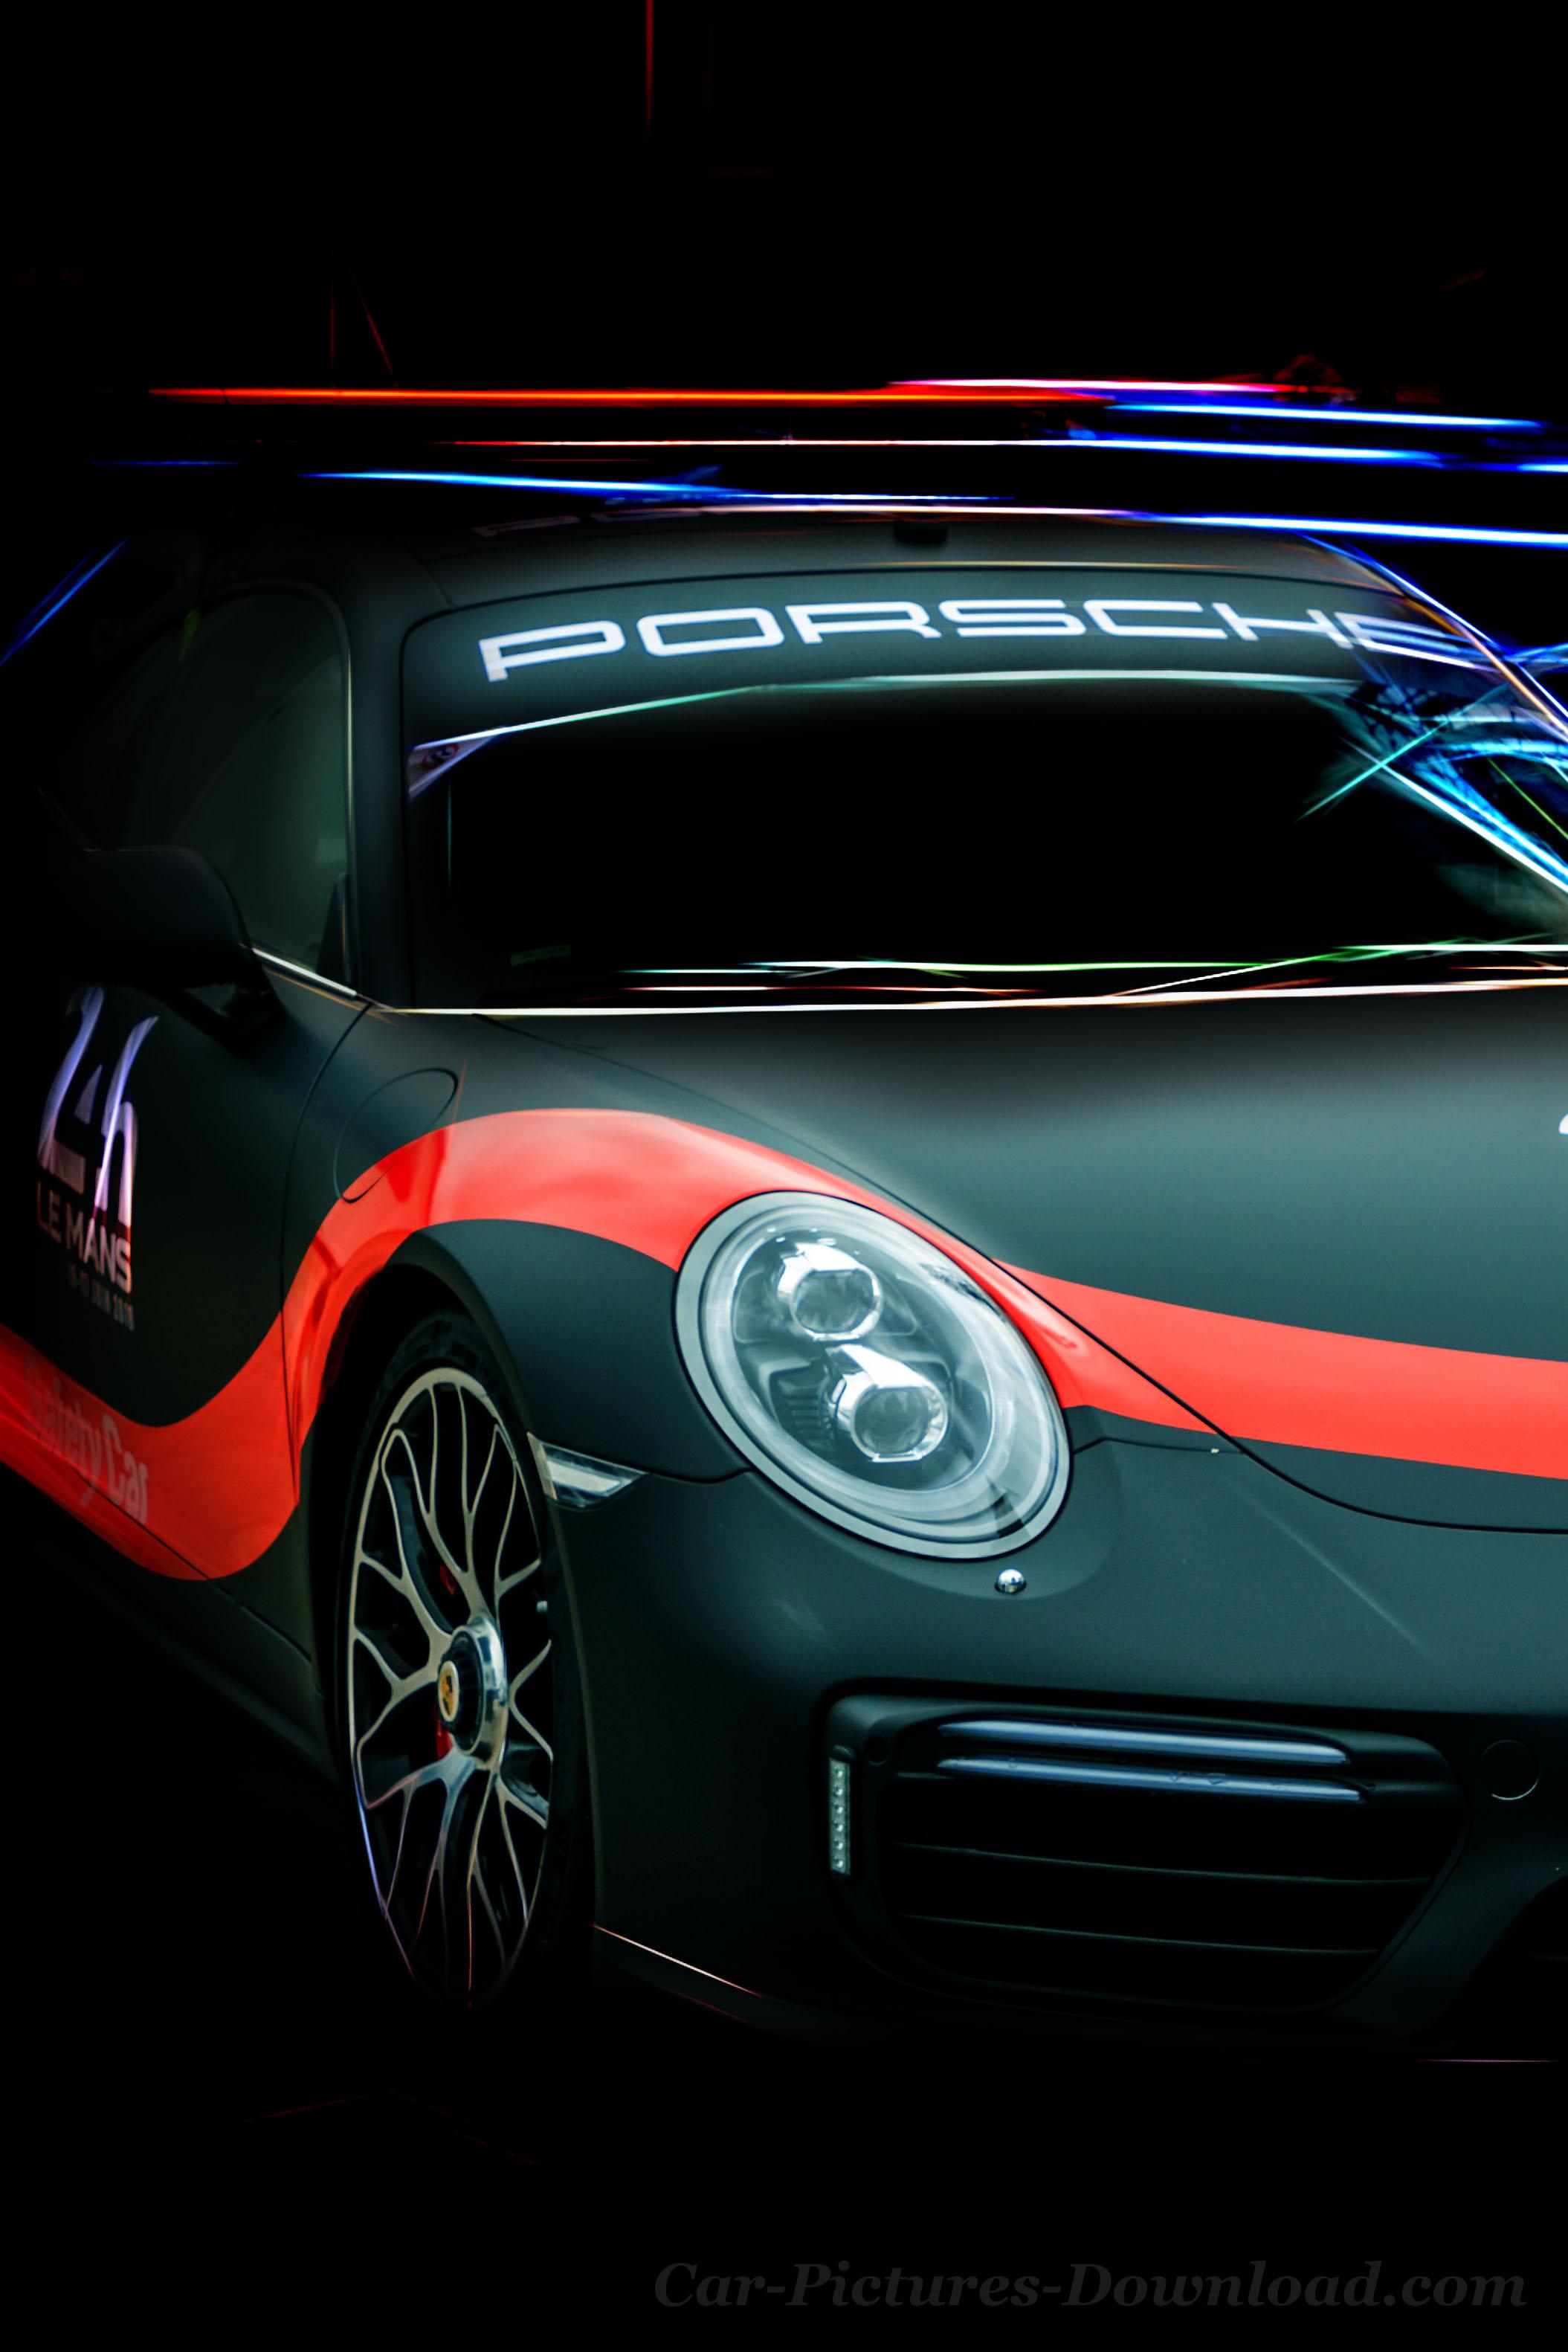 Free Download Porsche Wallpaper Images 4k Ultra Hd Mobile Pc Download 2109x3163 For Your Desktop Mobile Tablet Explore 54 Sports Cars Wallpaper Hd Sports Car Desktop Wallpaper Sports Car